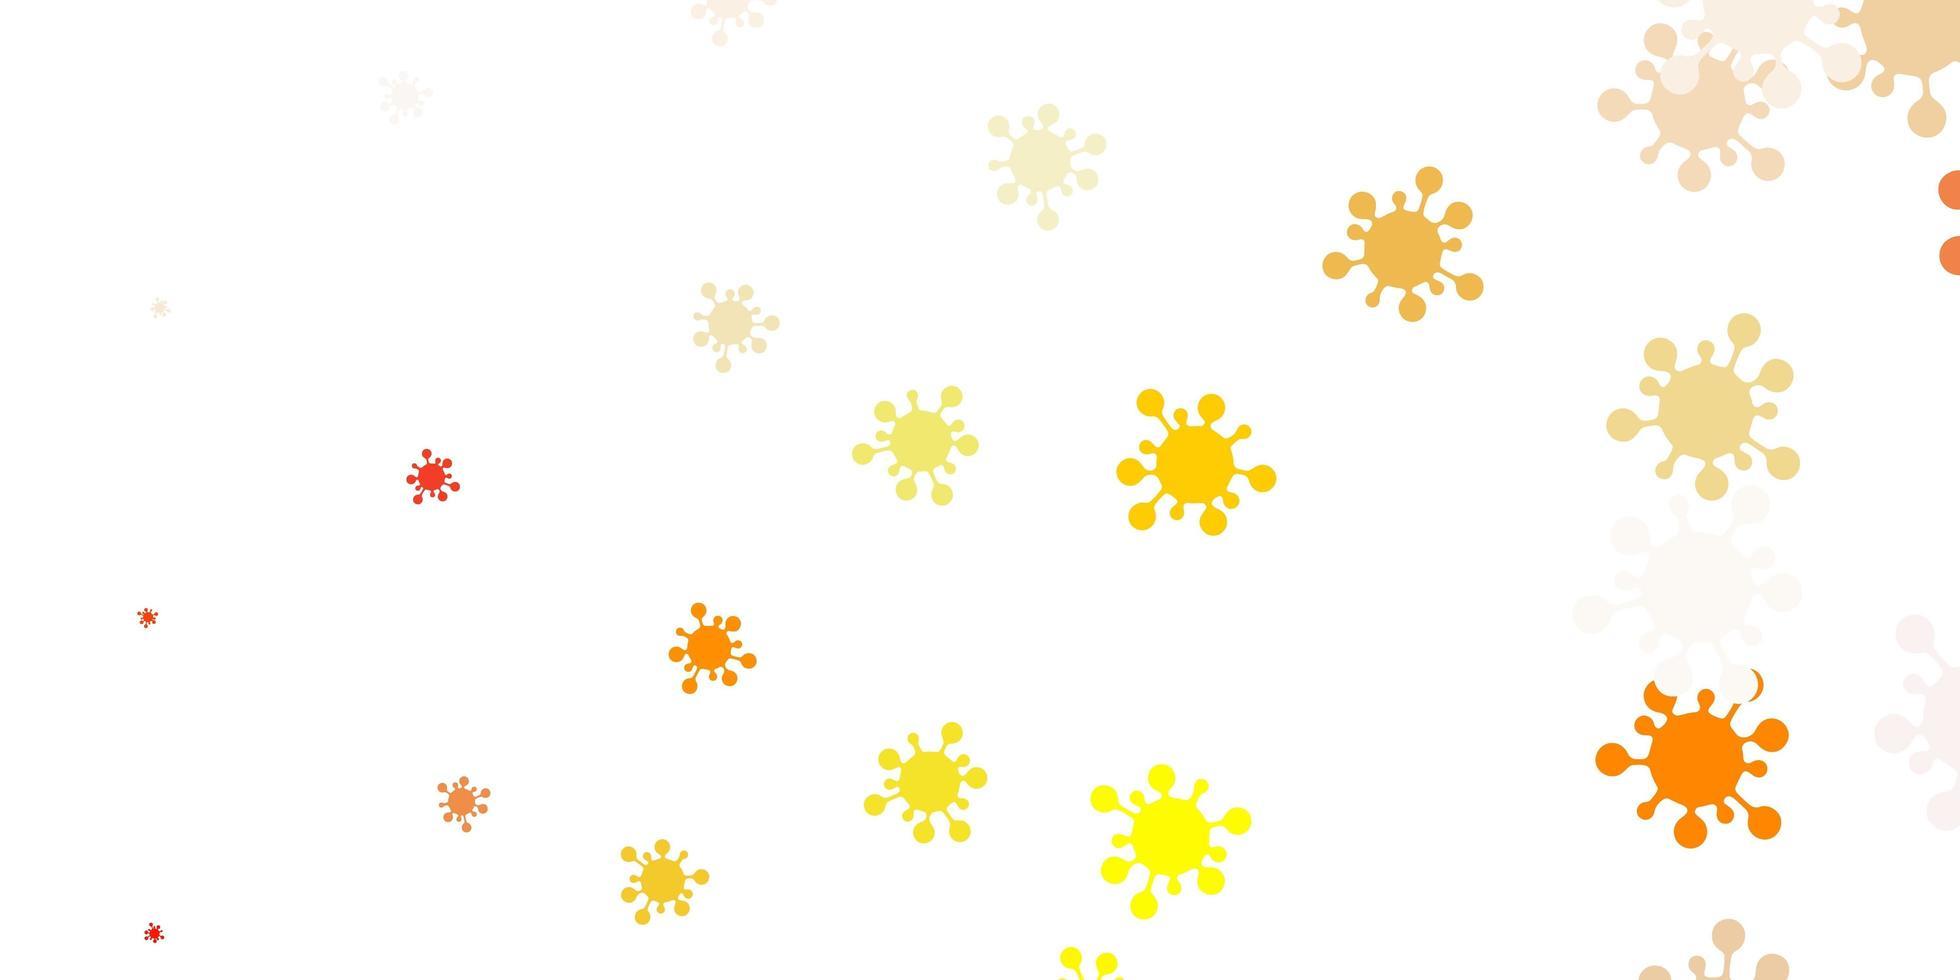 padrão de vetor laranja claro com elementos de coronavírus.